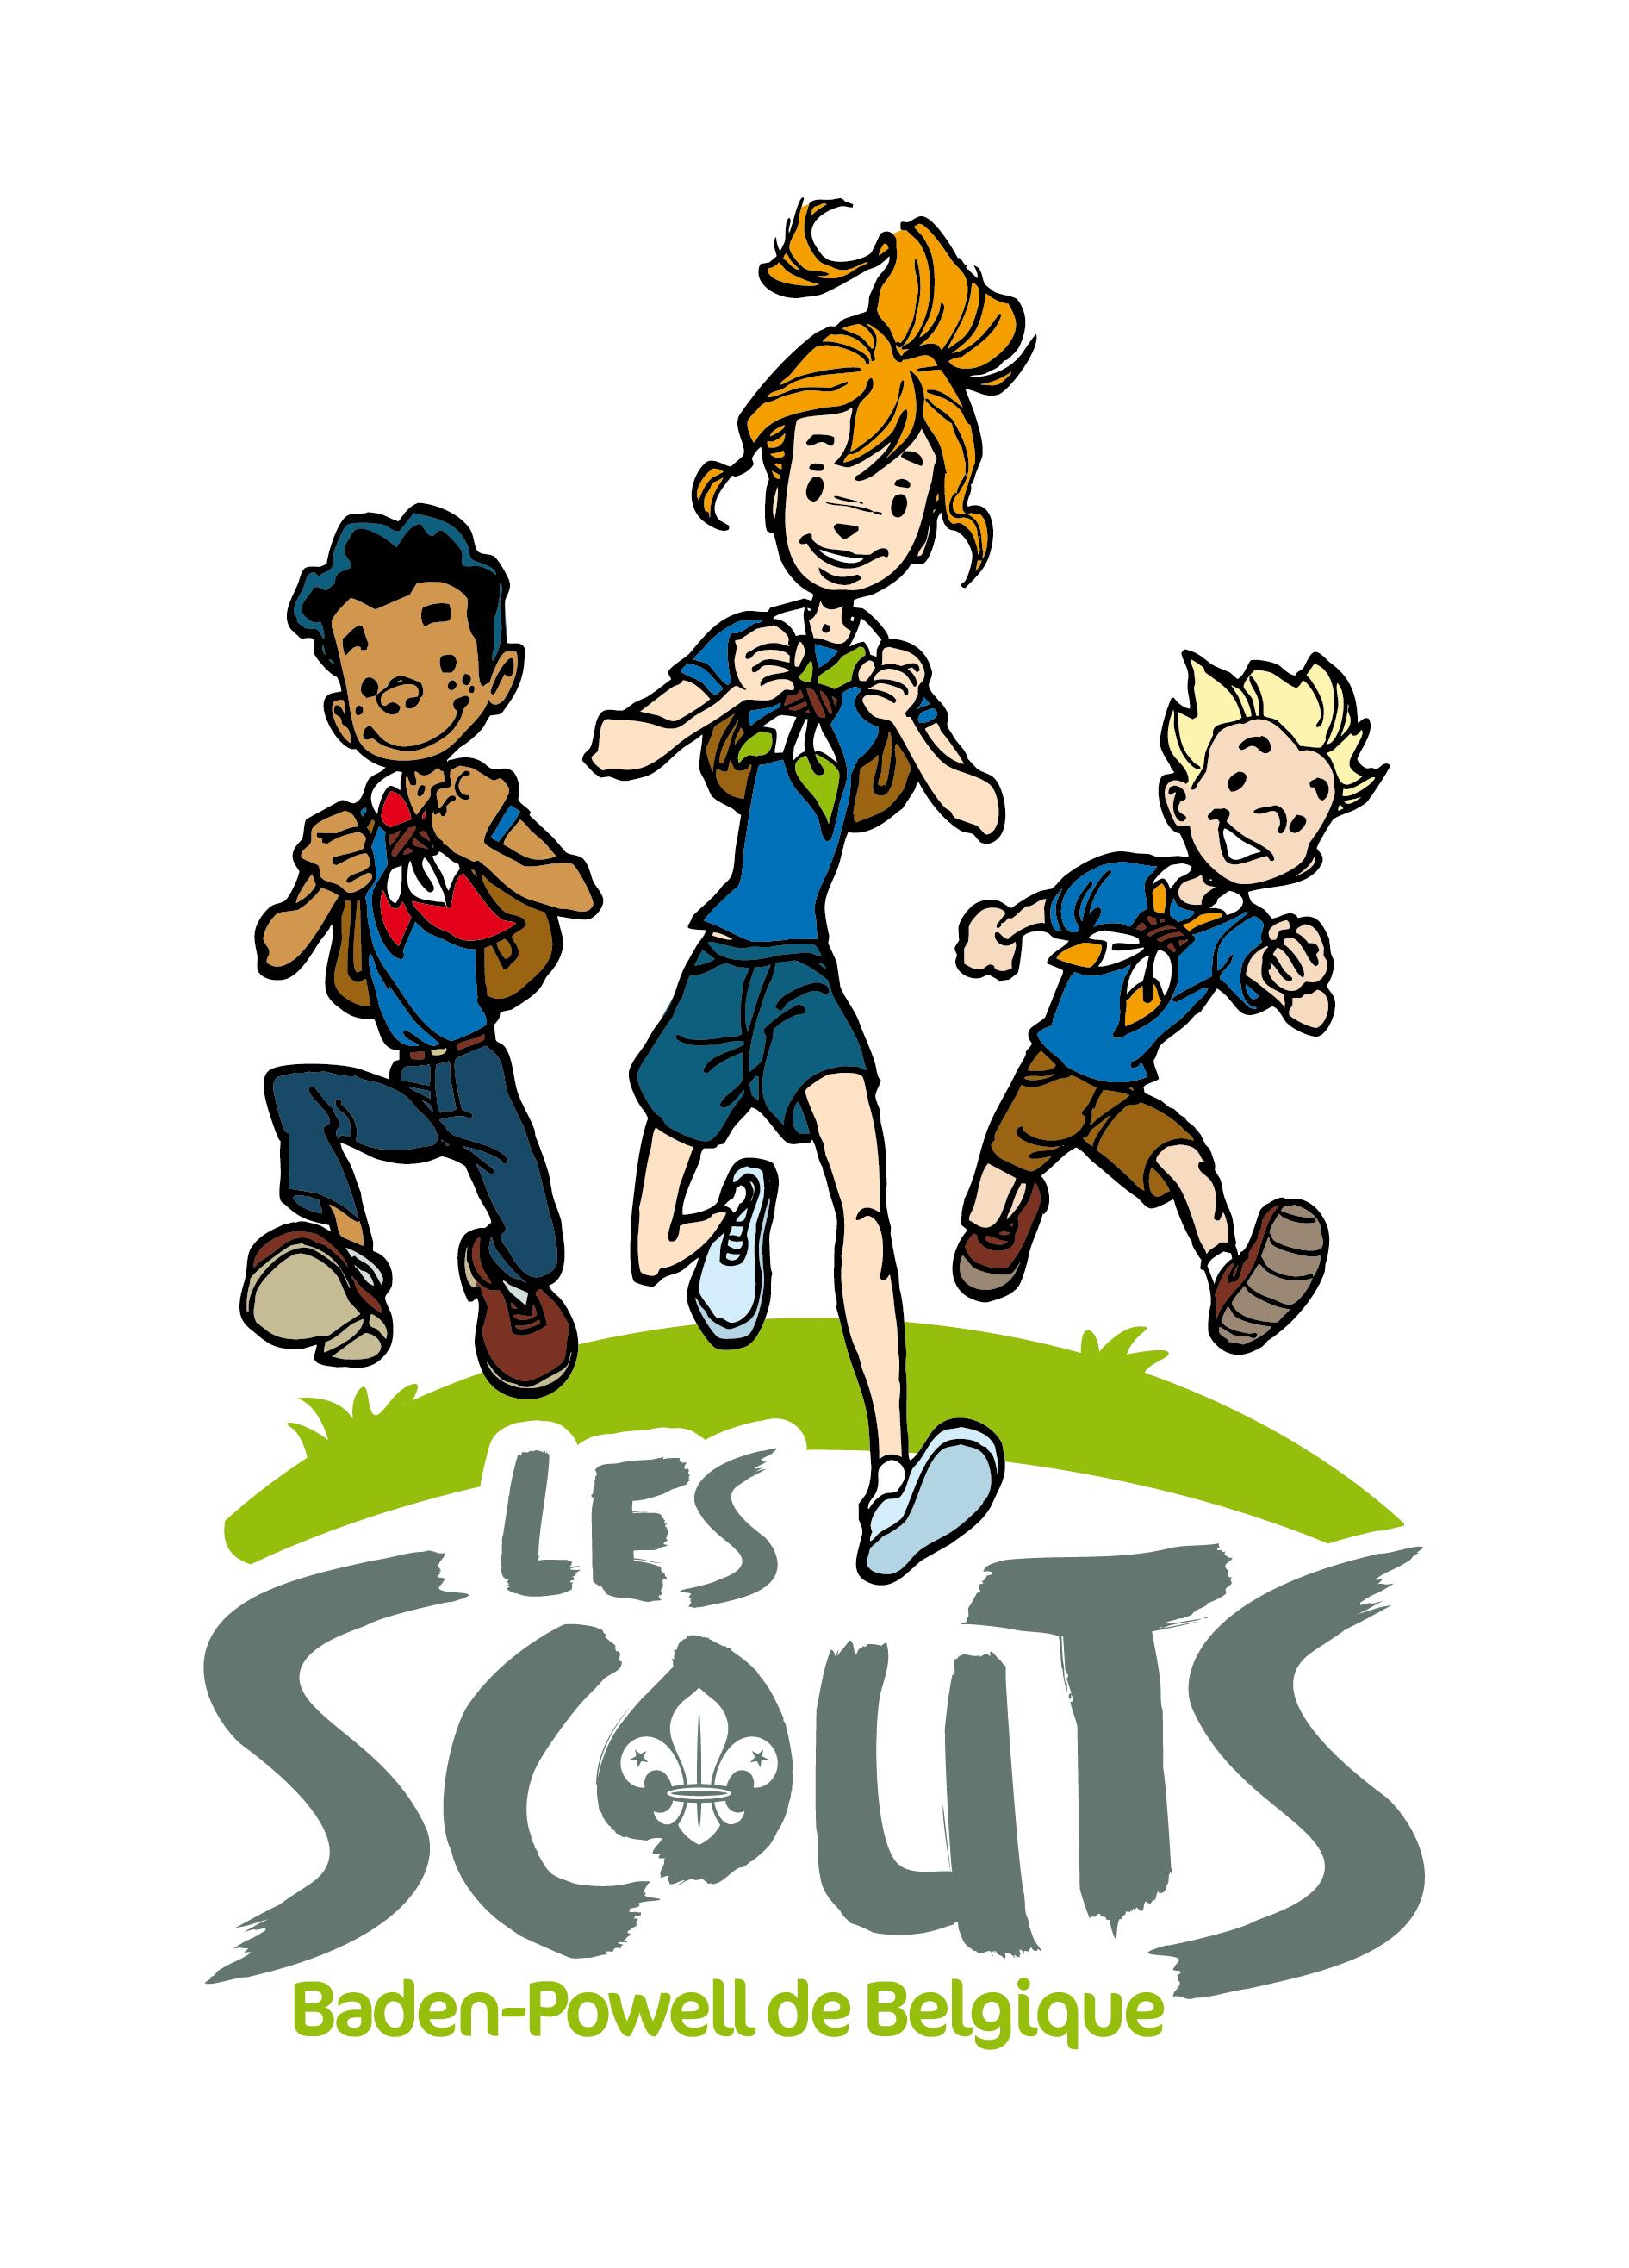 Les Scoutslogo